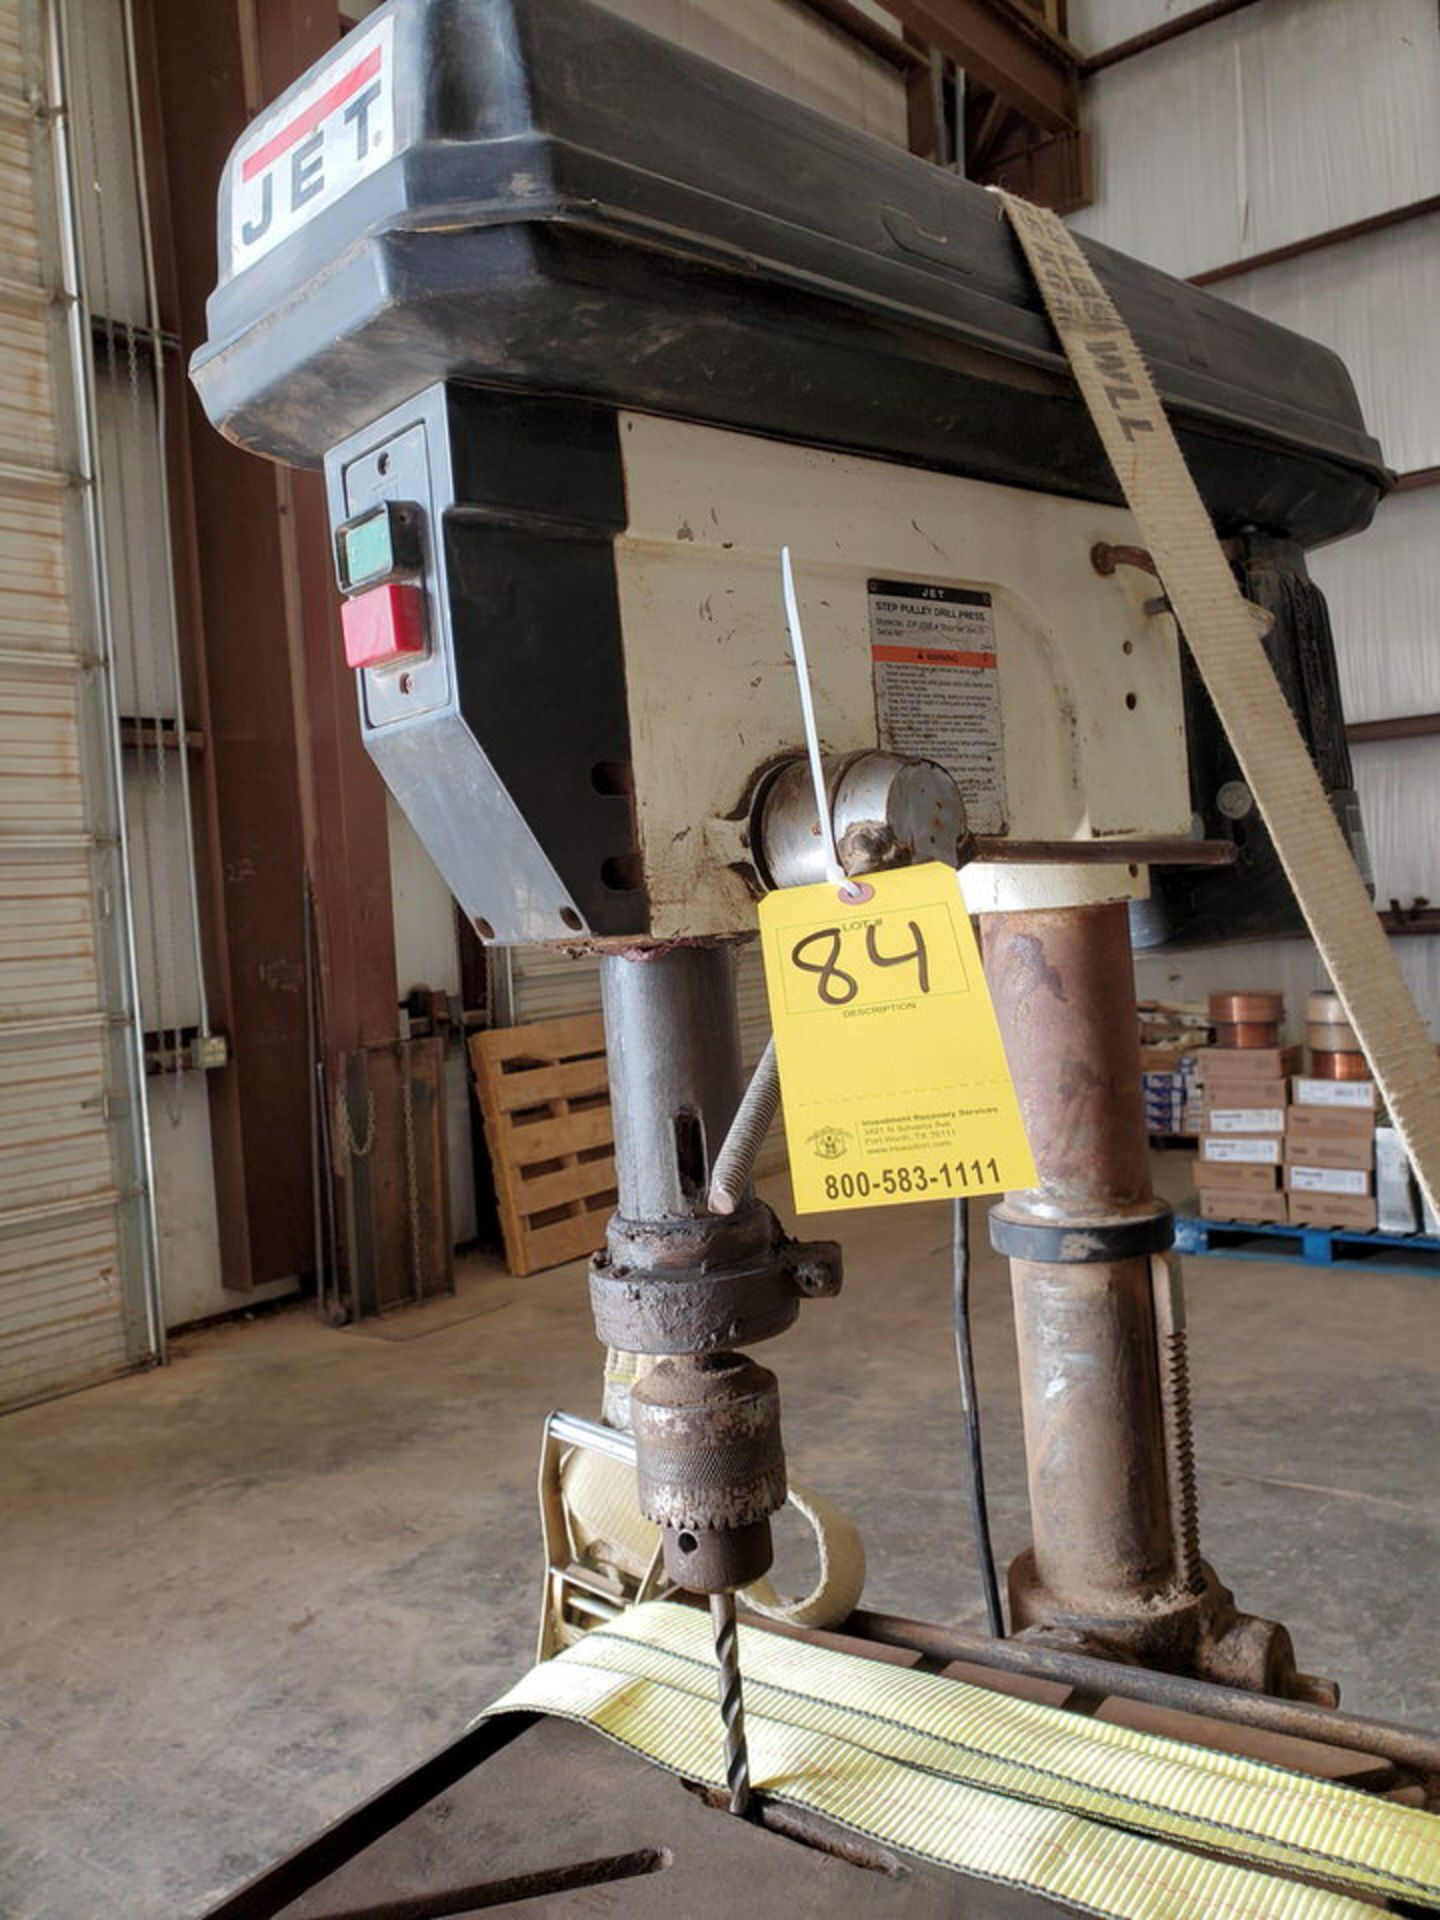 "JDP-20MF 20"" Drill Press 115/230V, 1-1/2HP, 1720RPM, 1"" Drilling Cap.; 16"" x 18"" Work Table - Image 4 of 8"